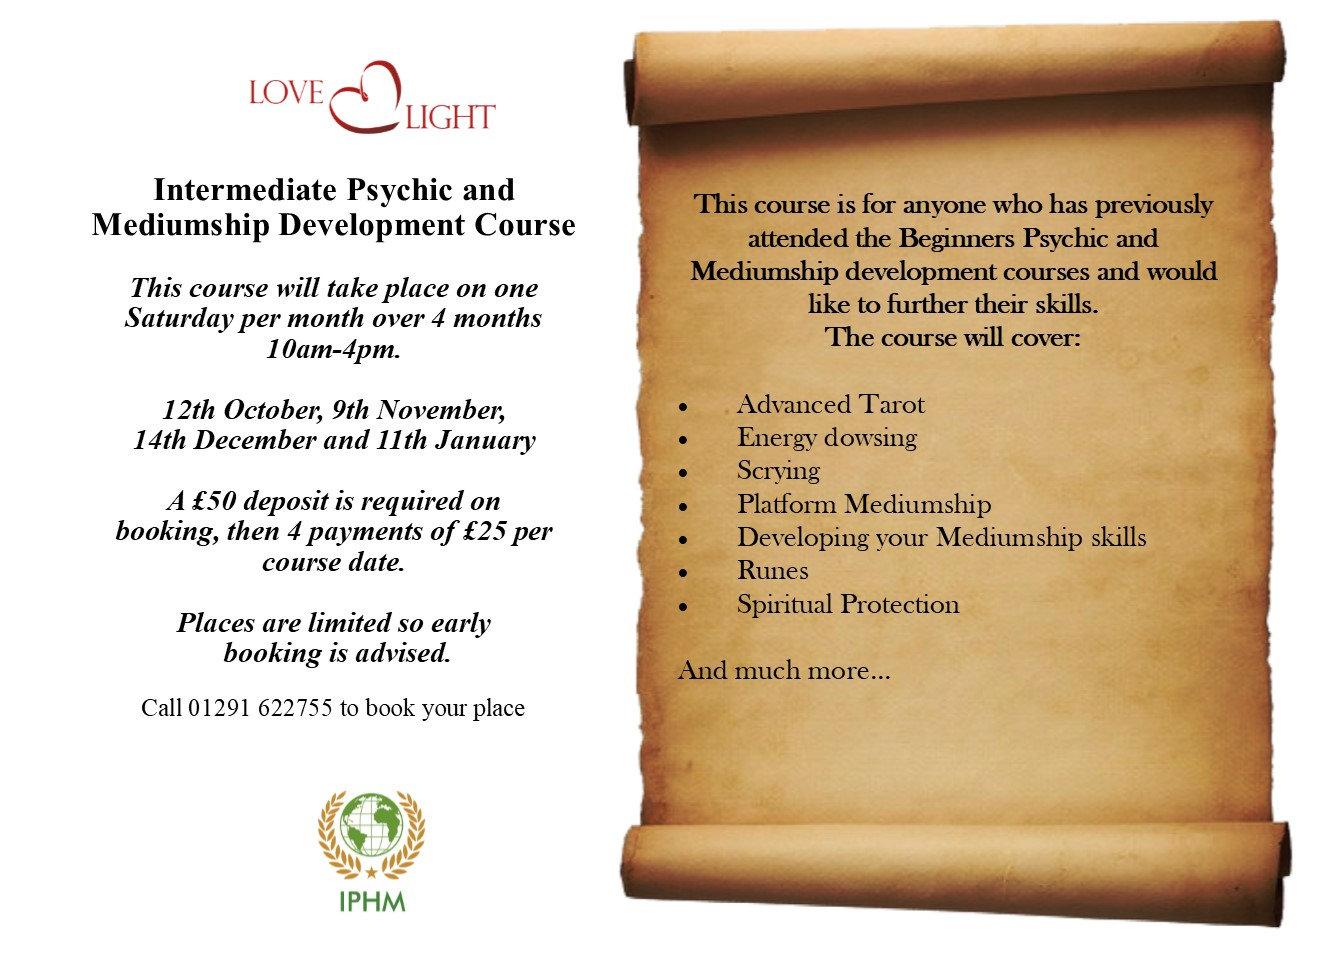 Intermediate Psychic & Mediumship course